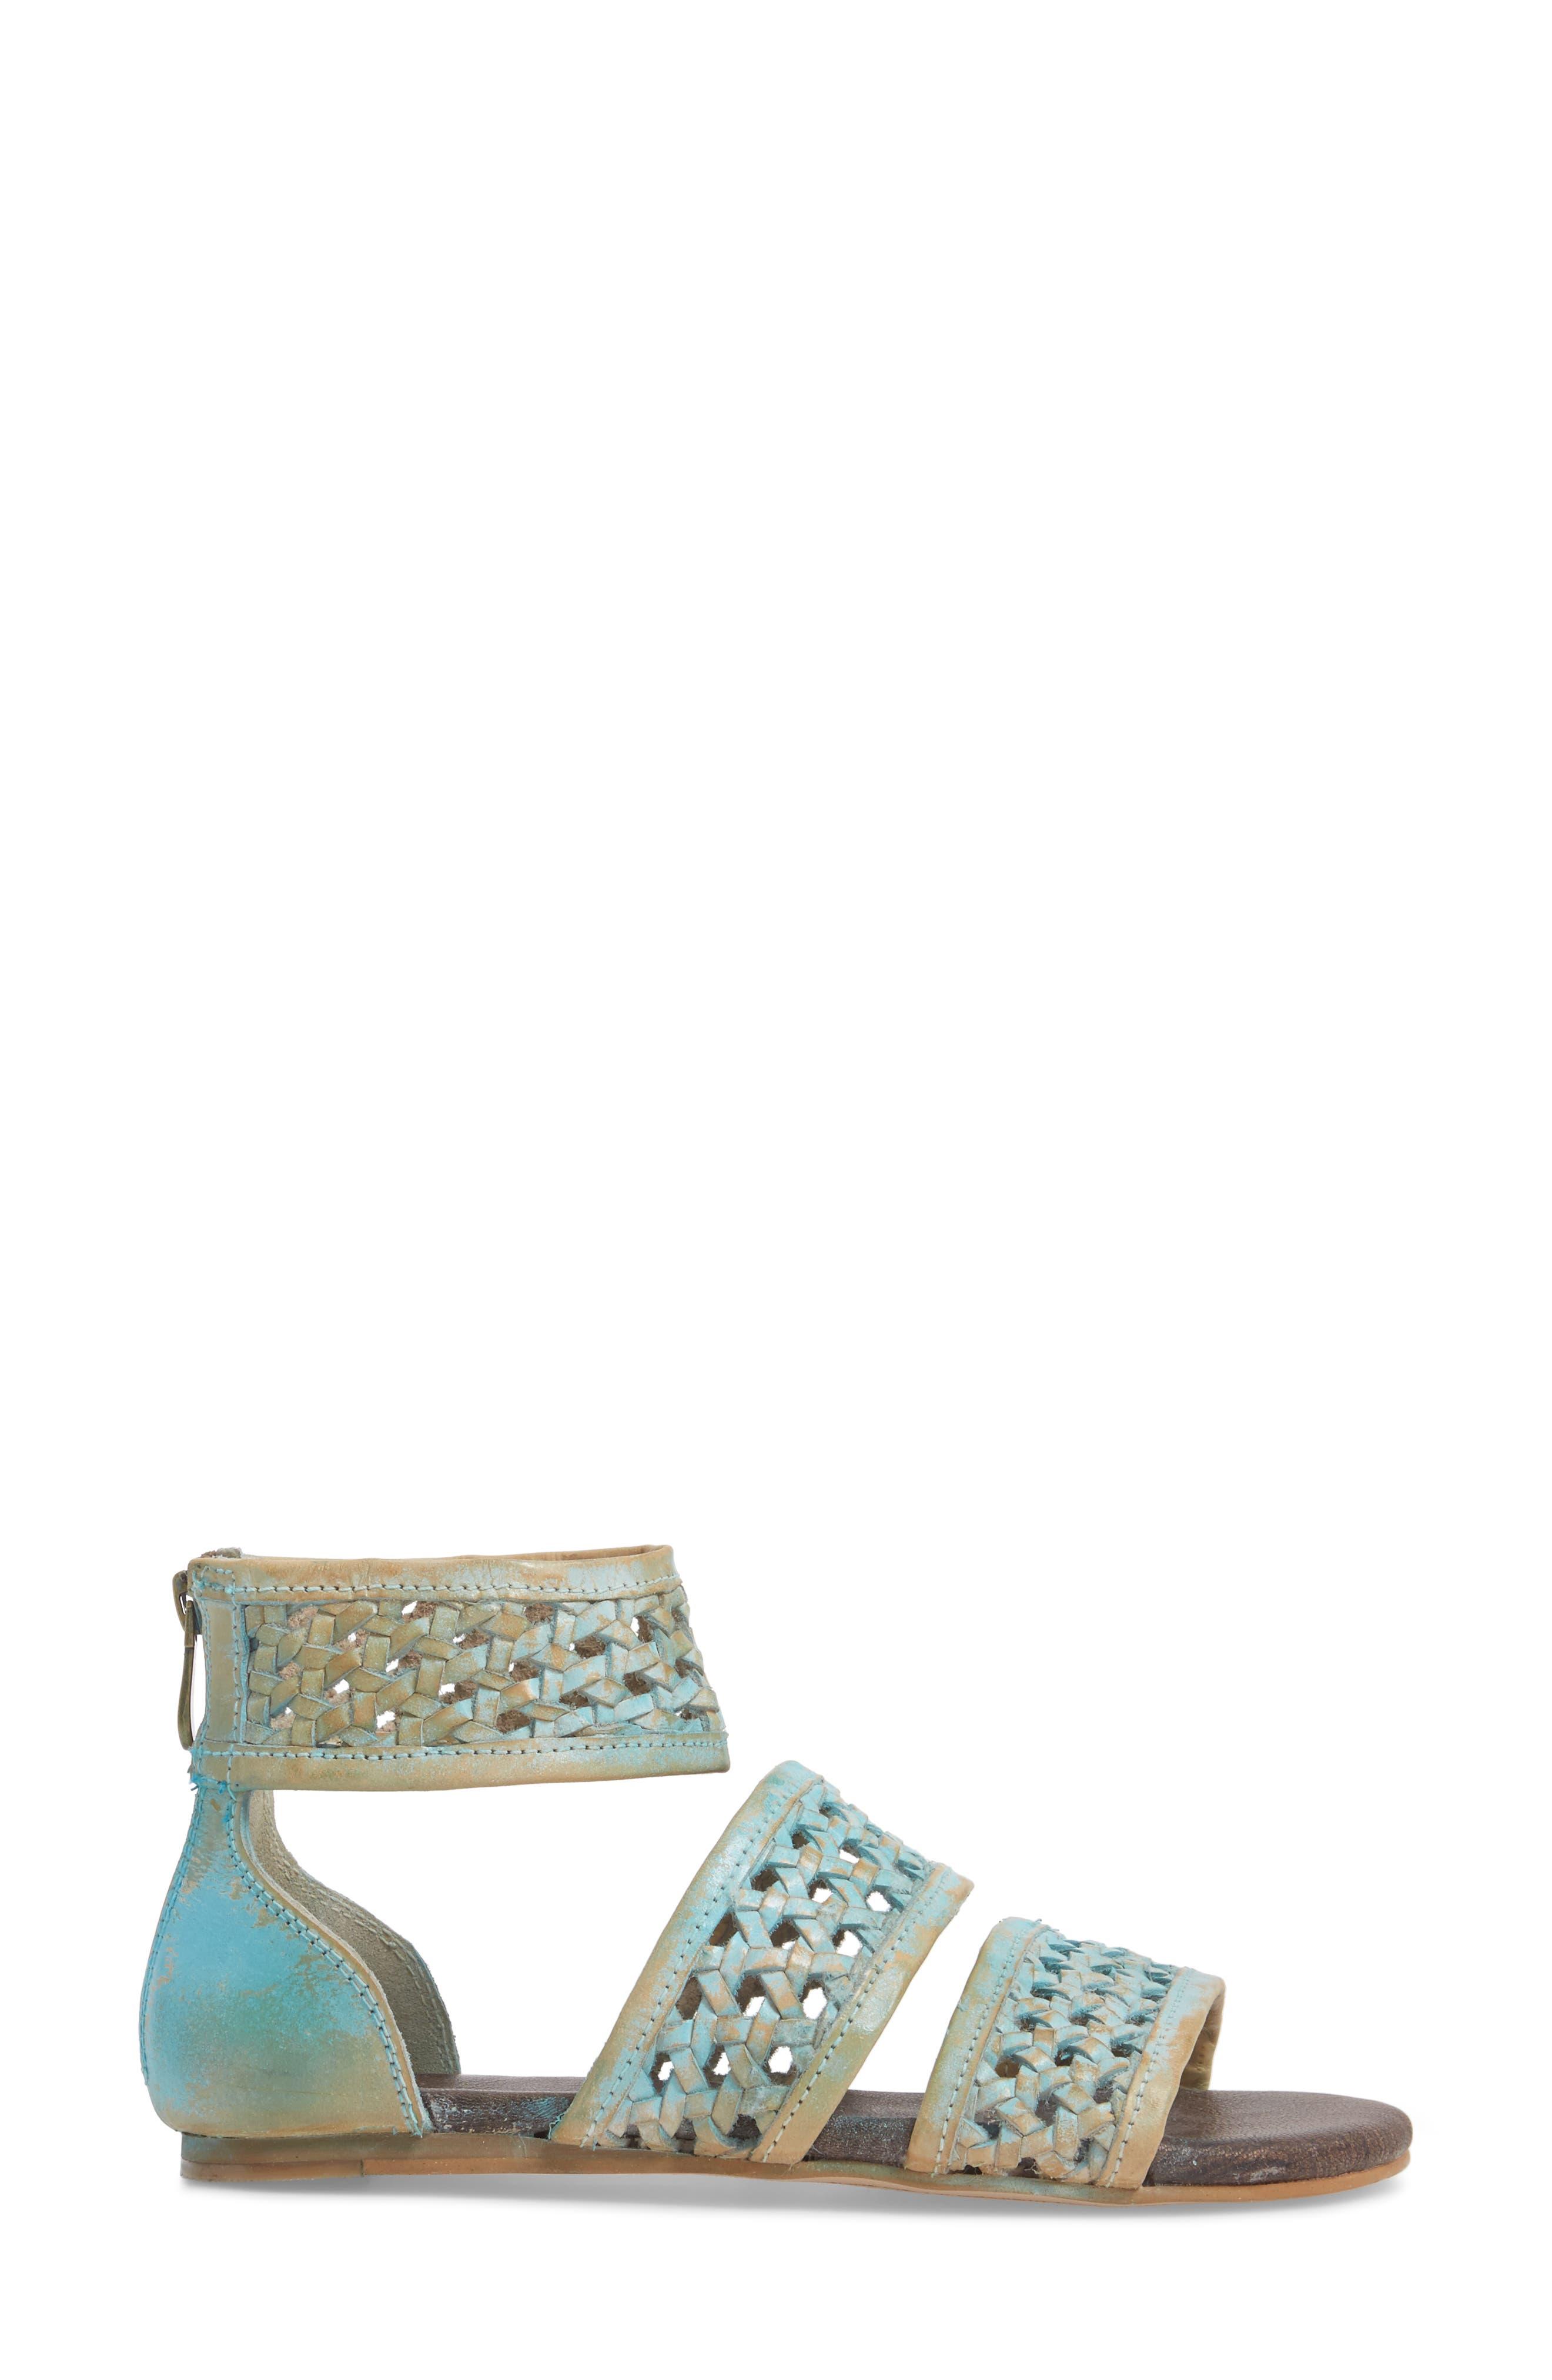 Clio Woven Ankle Cuff Sandal,                             Alternate thumbnail 3, color,                             Blue